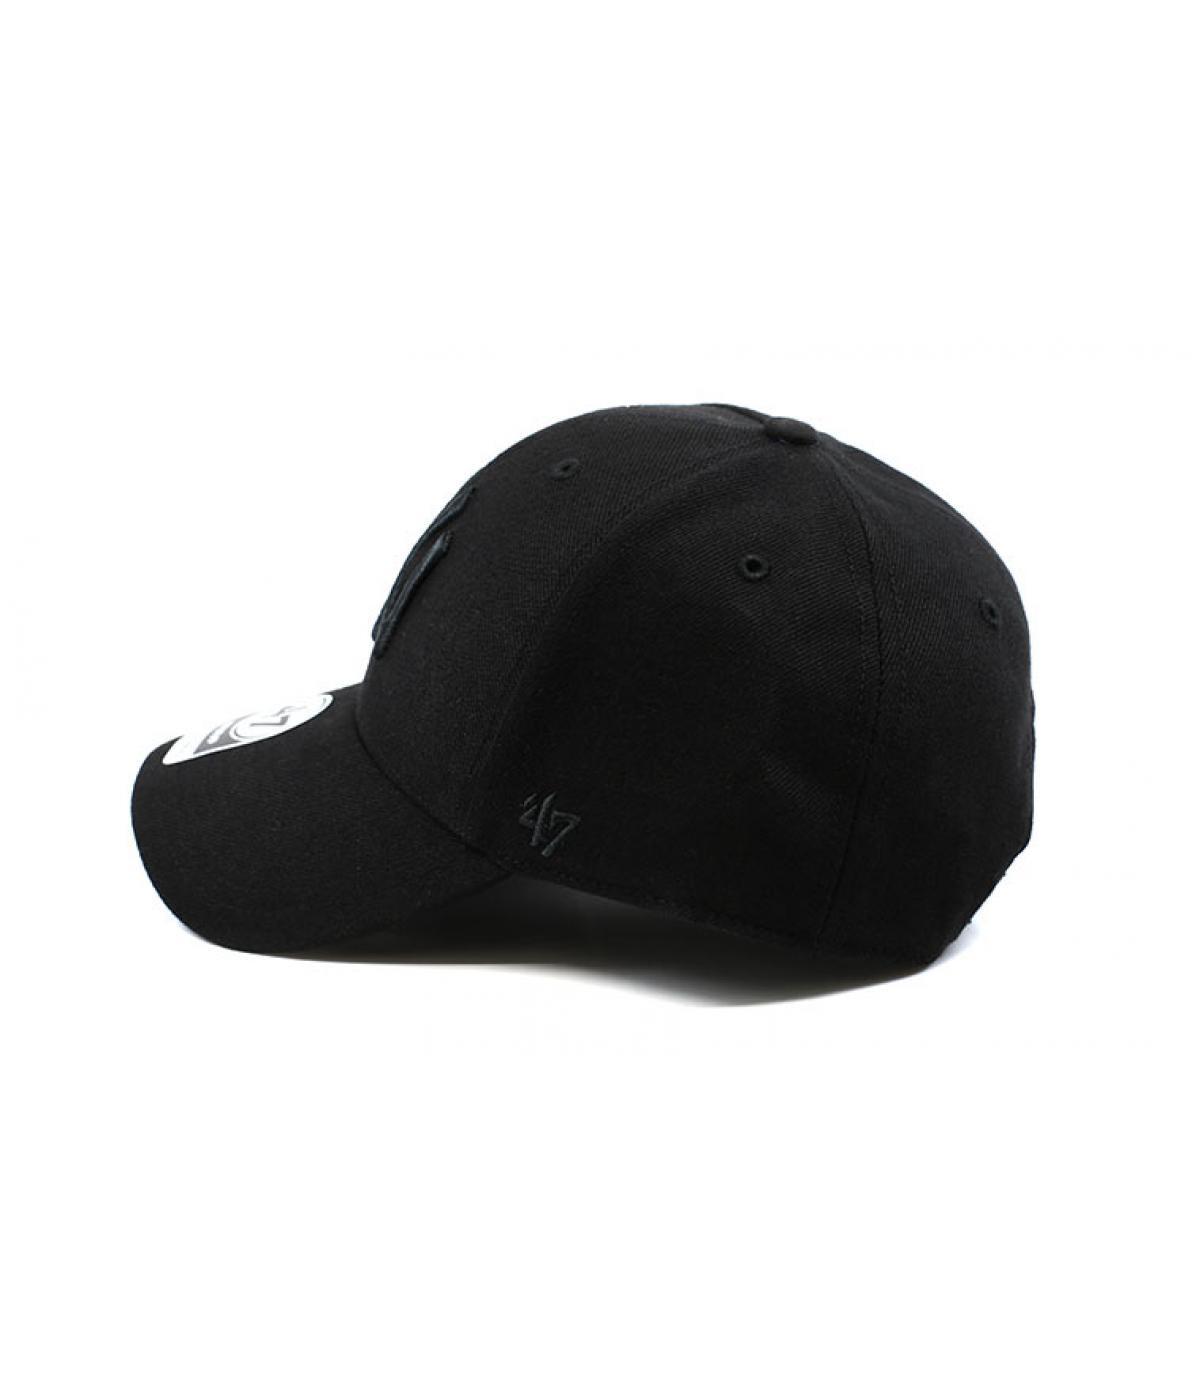 casquette ny noir laine mvp ny snapback all black par 47 brand headict. Black Bedroom Furniture Sets. Home Design Ideas